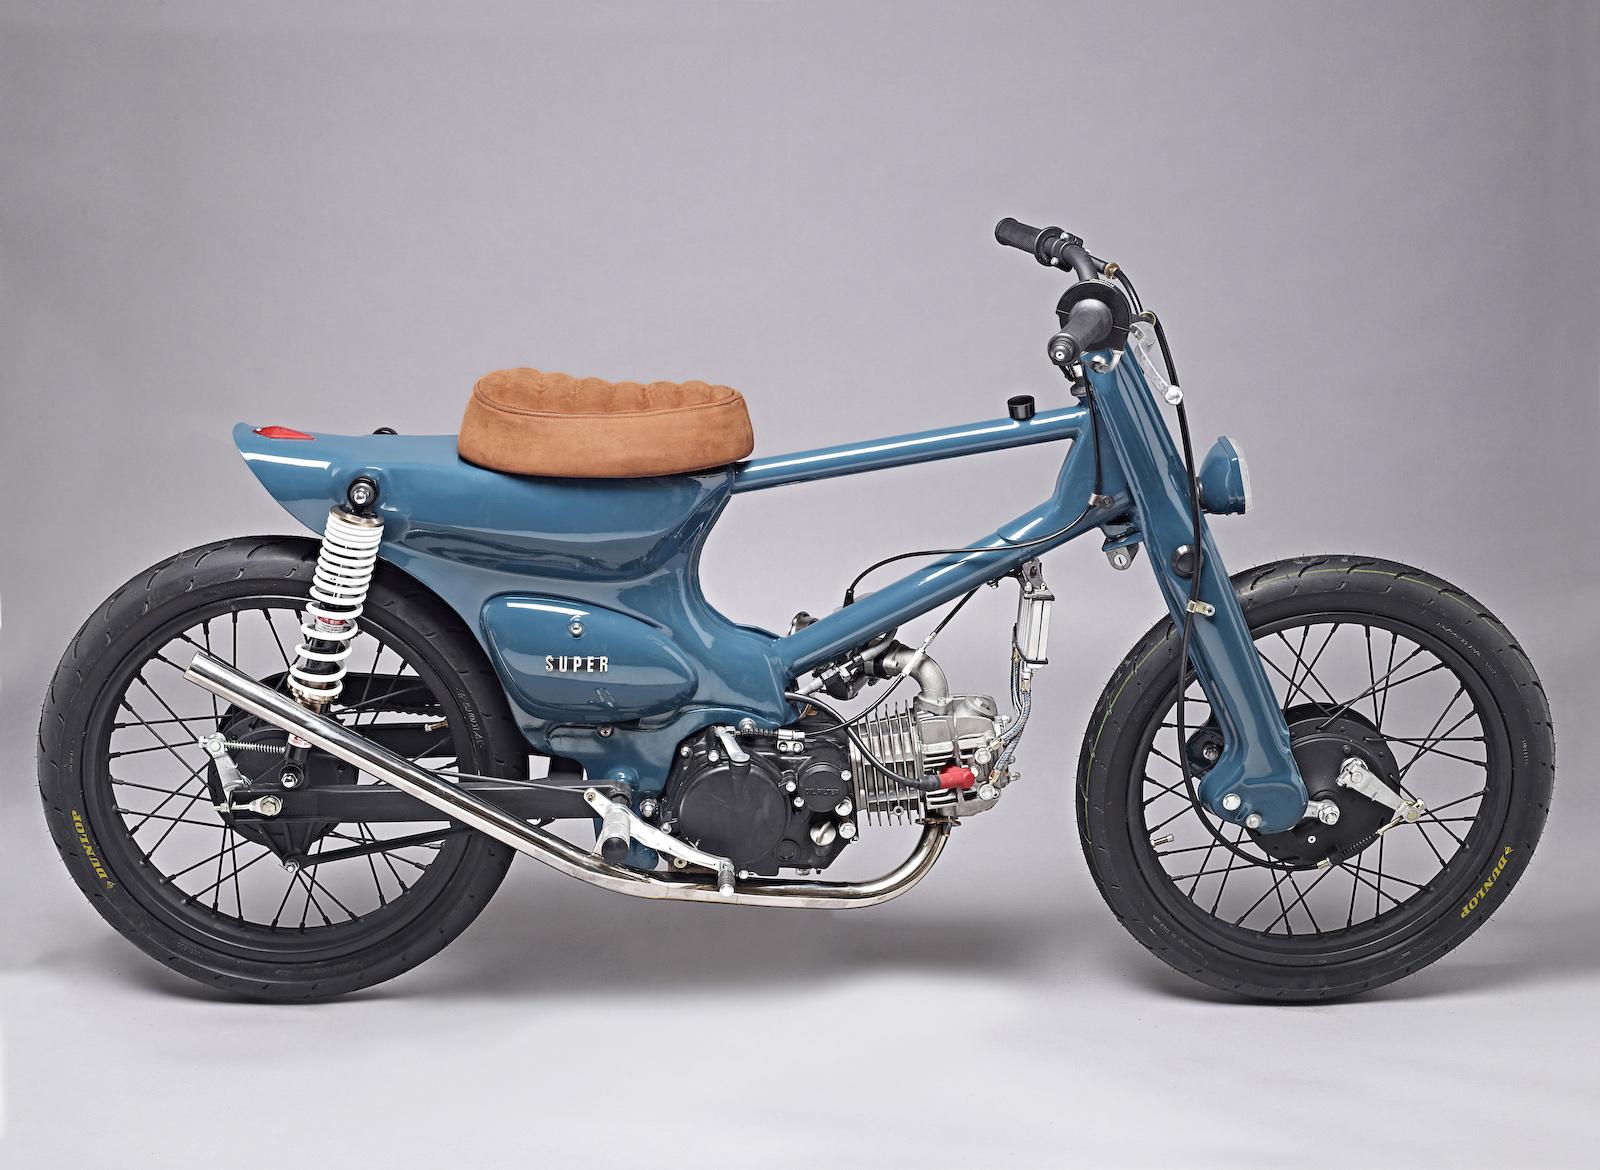 moto-mucci  daily inspiration  super motor company